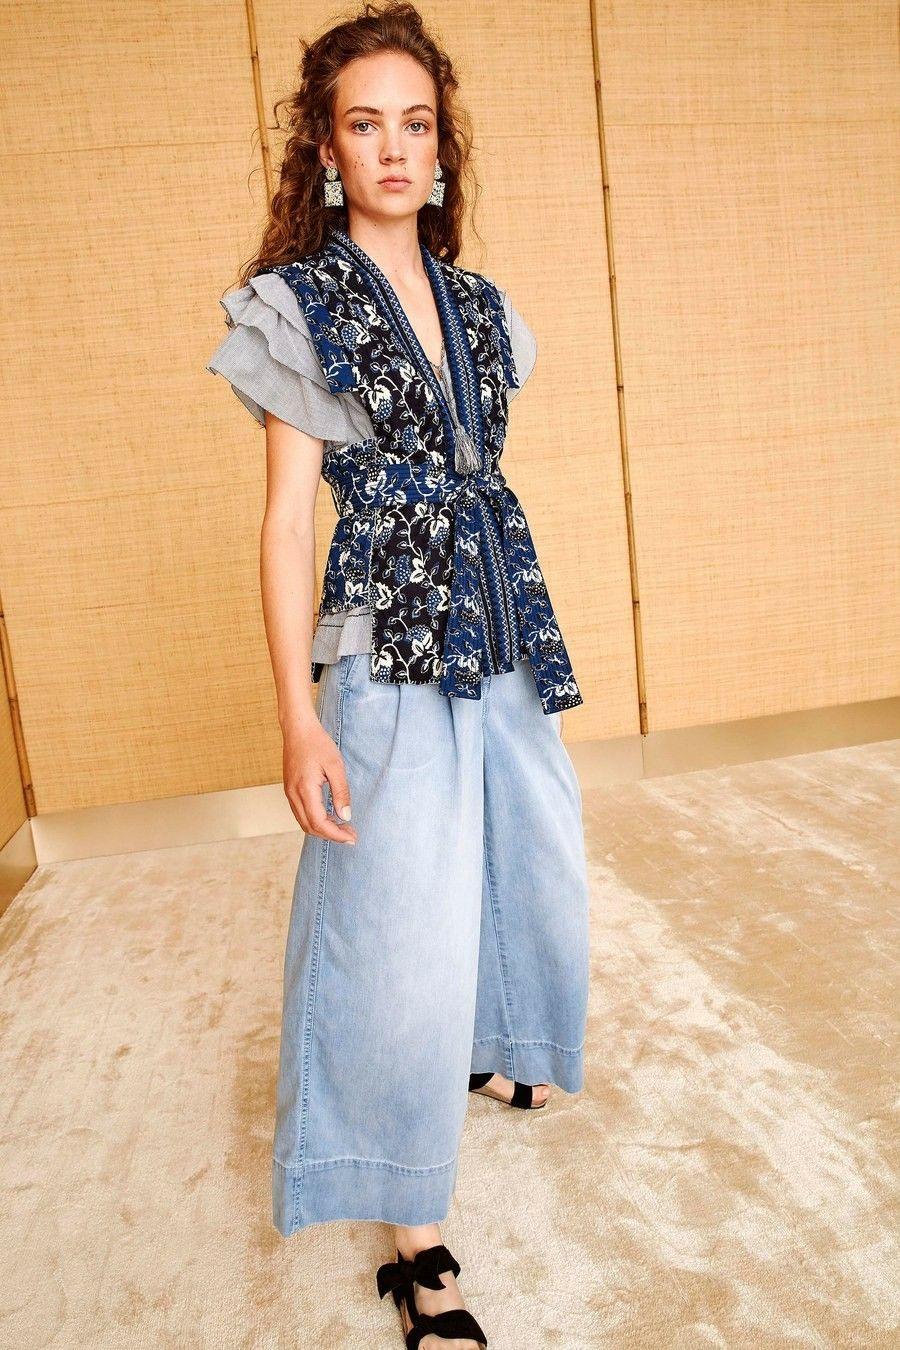 Pin by winnie cheung on fashion ideas pinterest fashion